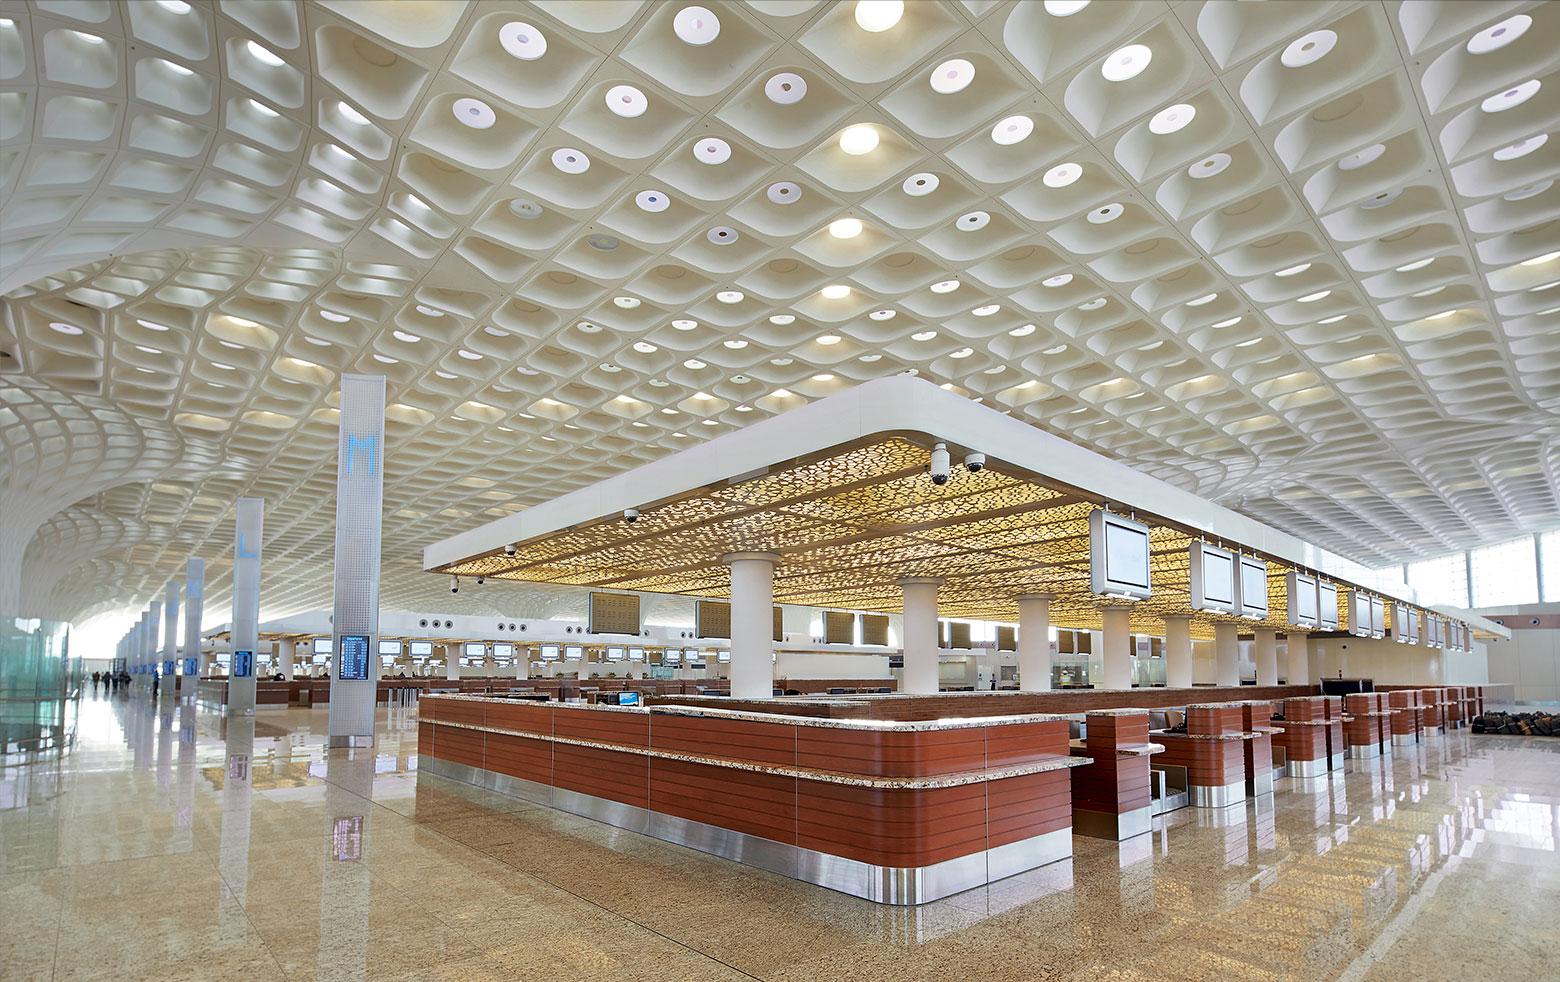 Prinz Optics Colour Effect Glass in the Mumbai airport